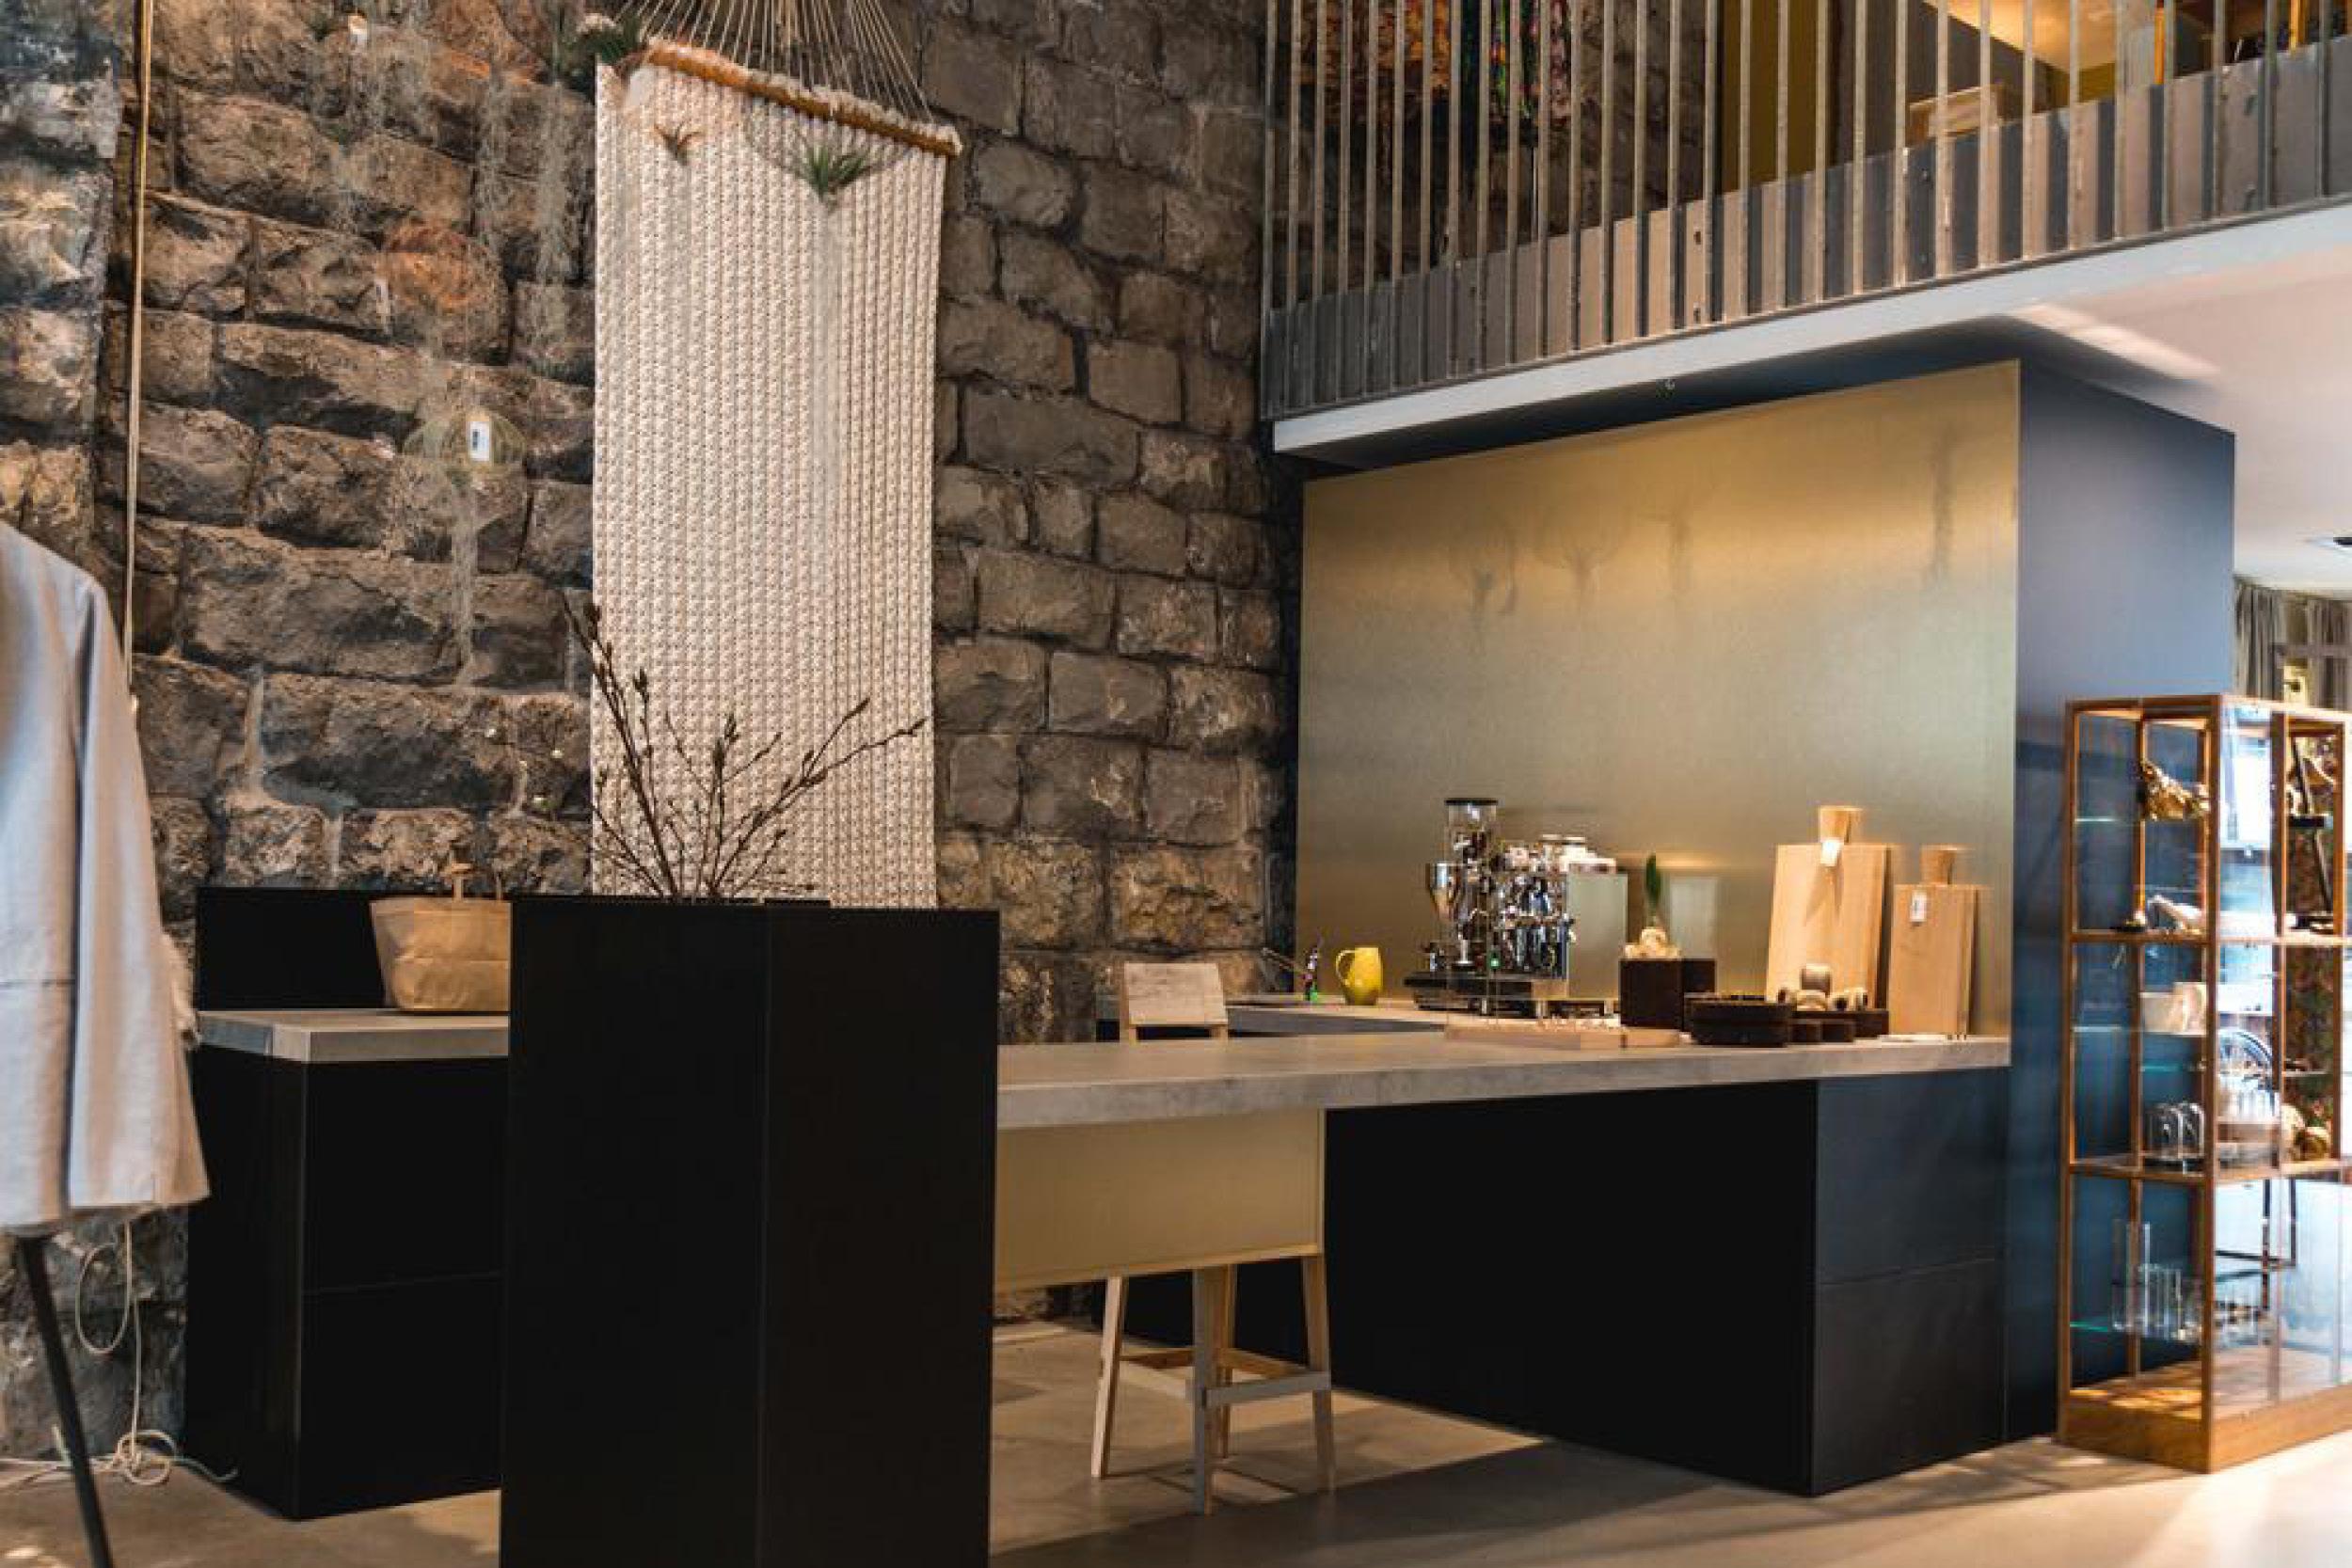 nl 3|2019 shops